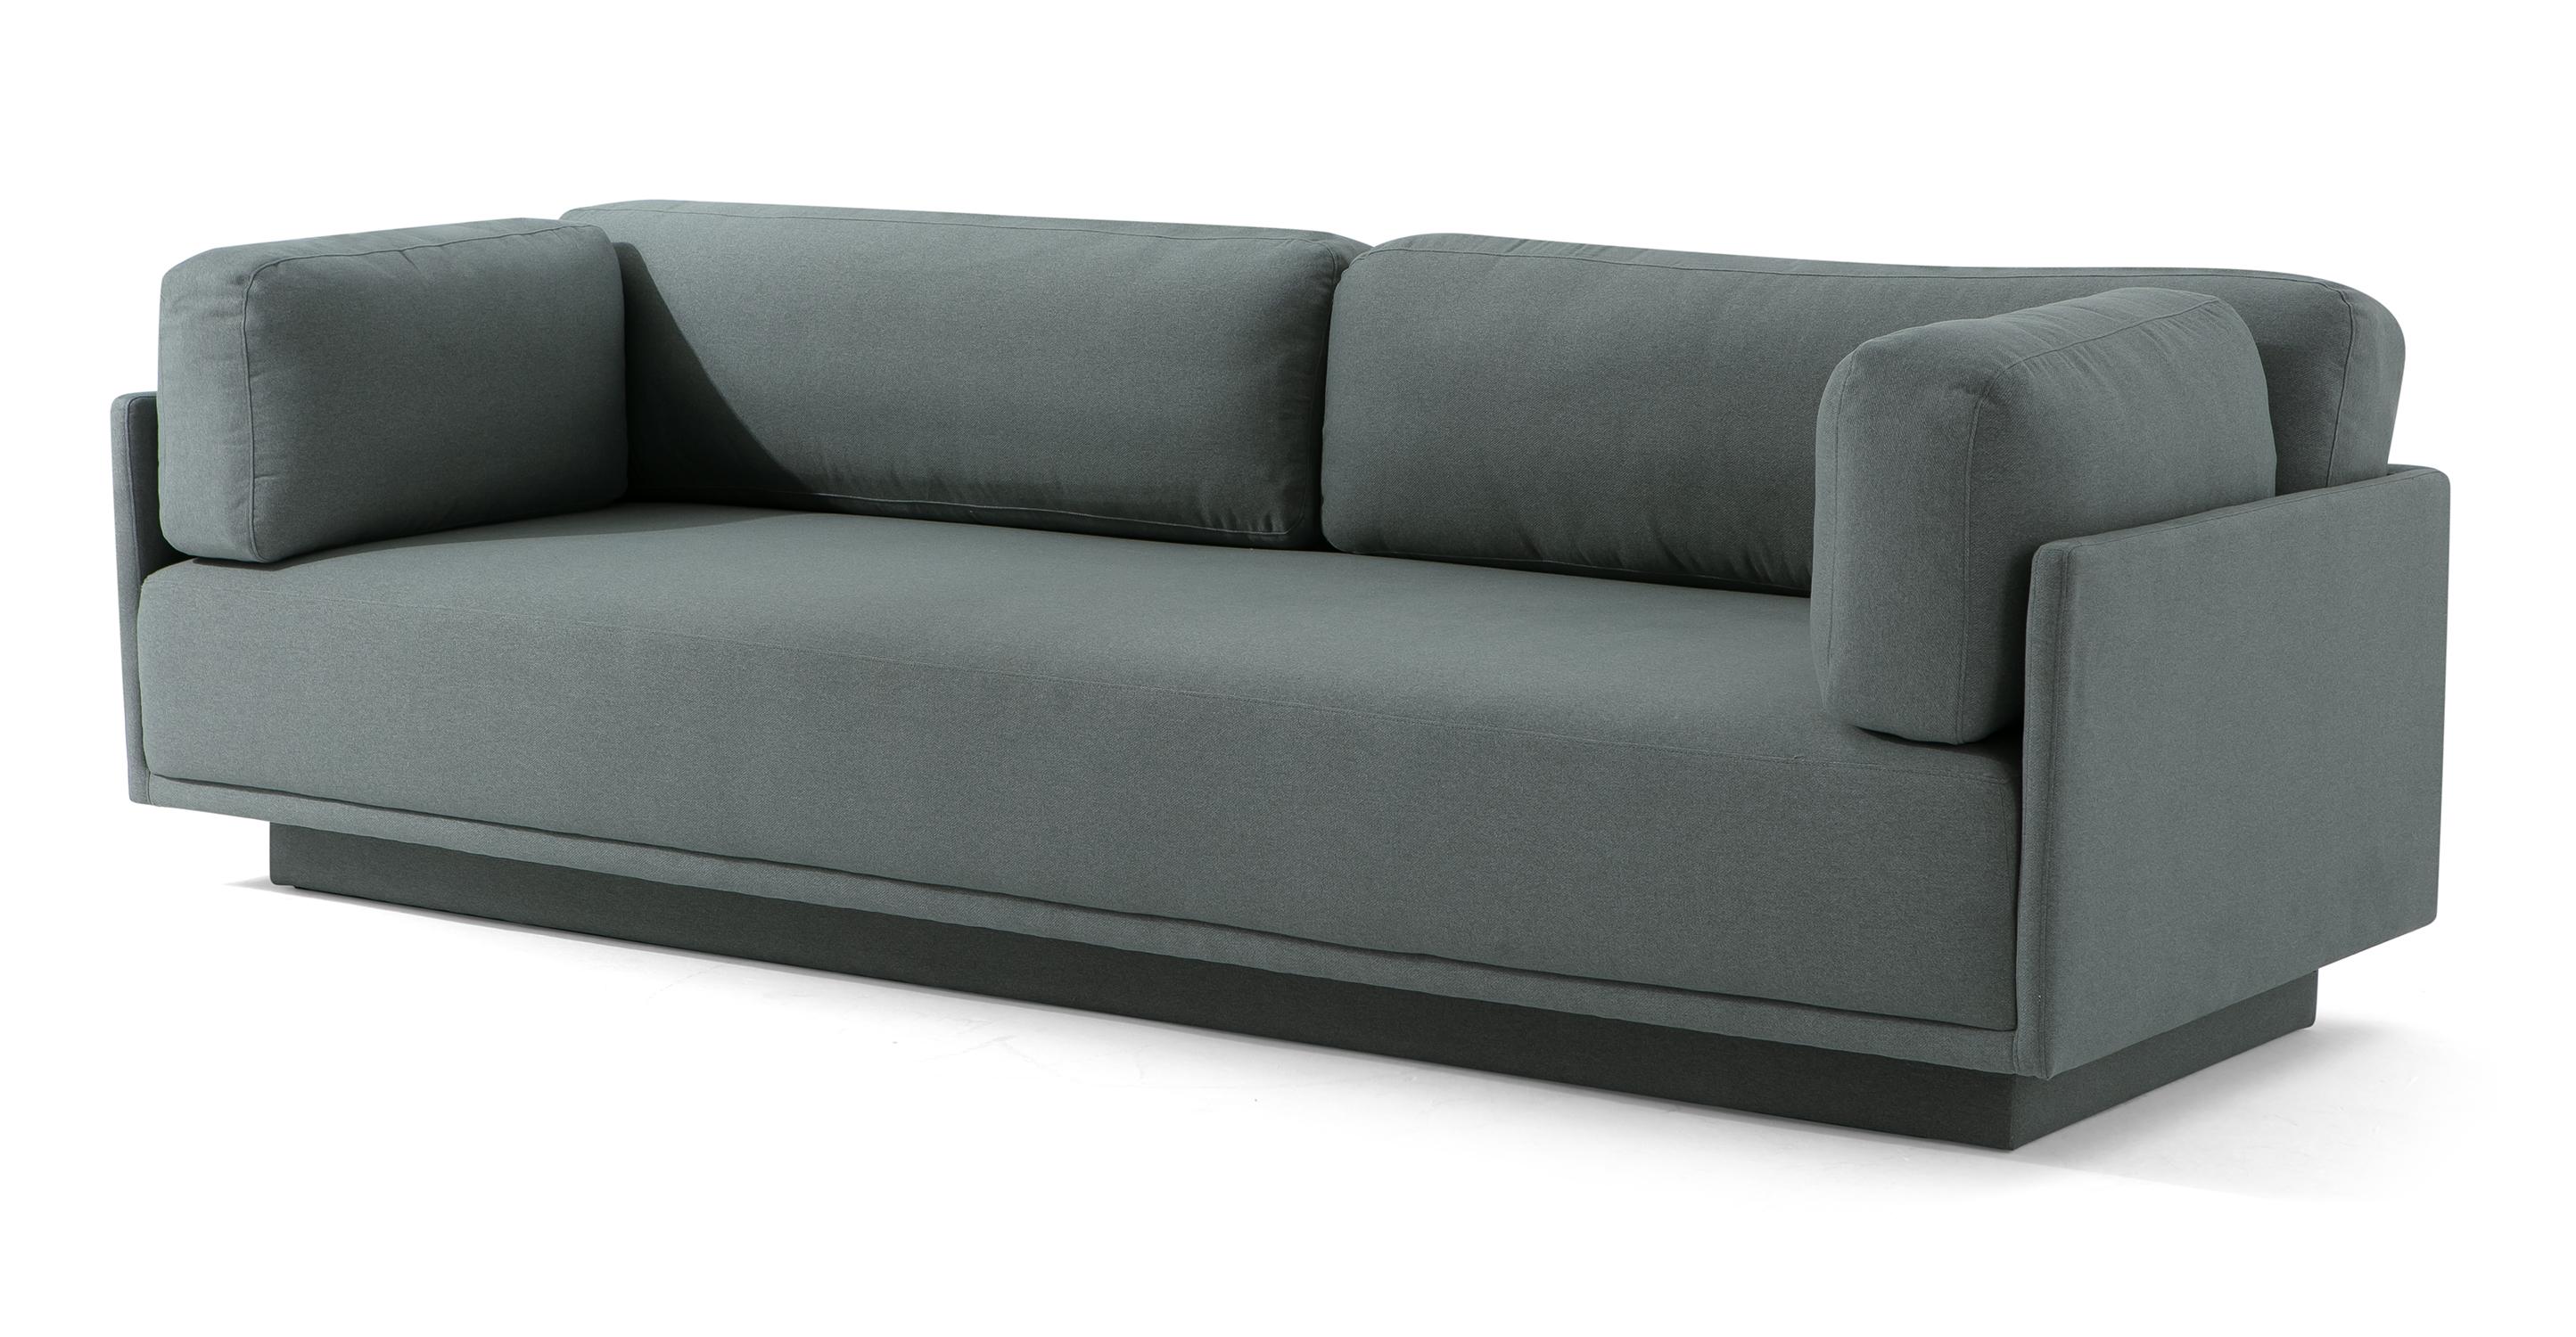 "Cribb XL 102"" Fabric Sofa, Pigeon"